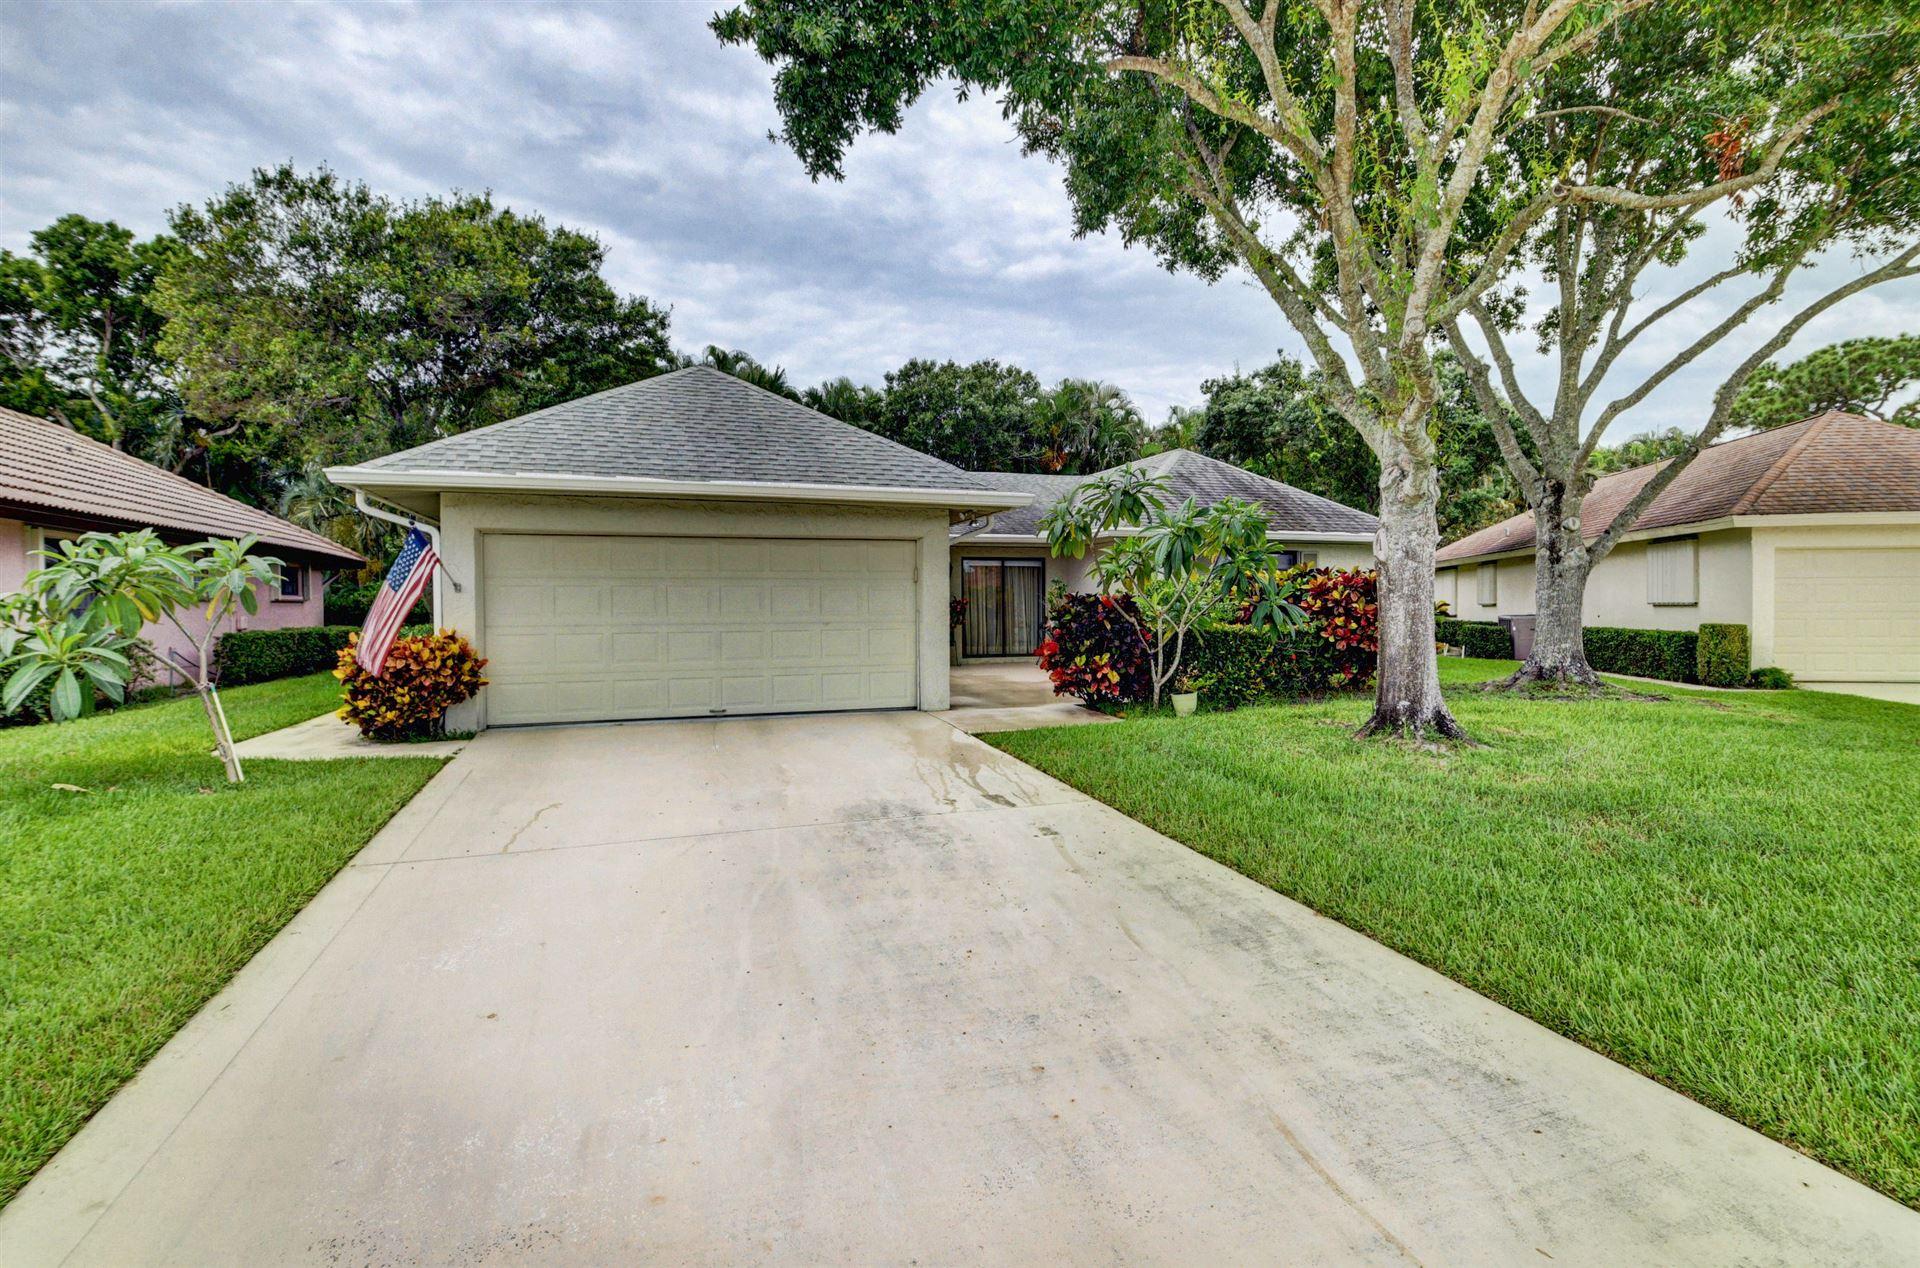 10363 Greentrail Drive N, Boynton Beach, FL 33436 - #: RX-10642297